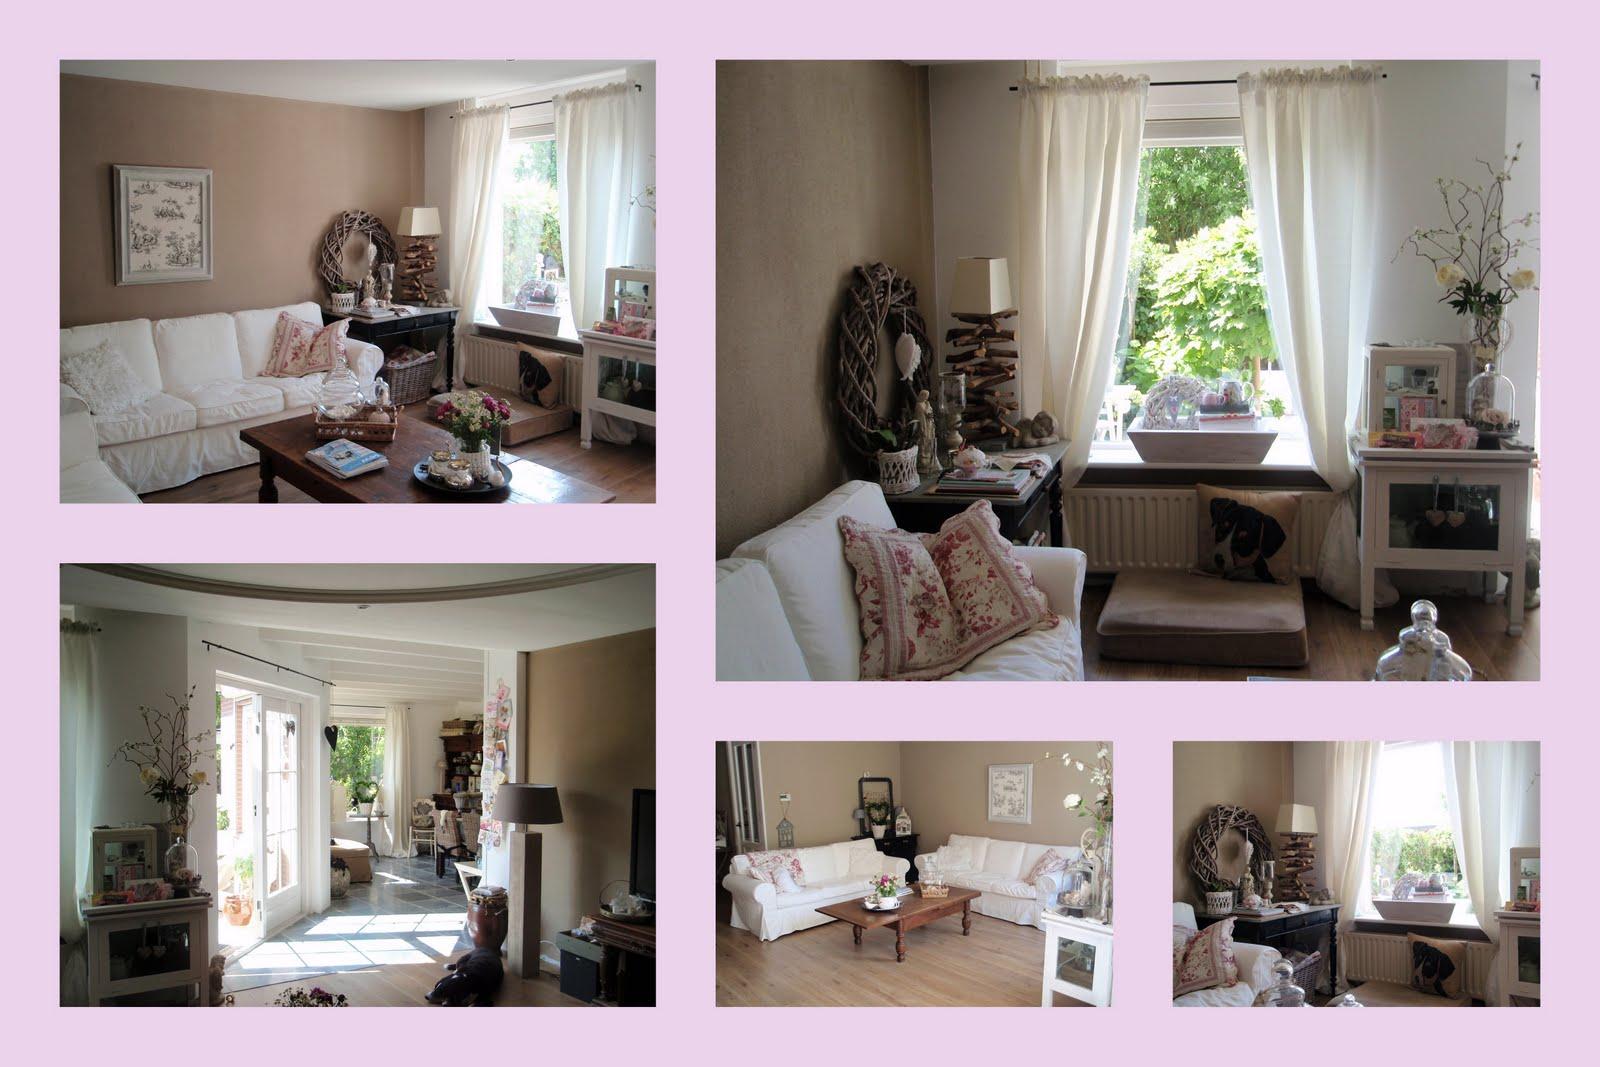 Decor woonkamer scandinavisch - Decoratie appartement design ...